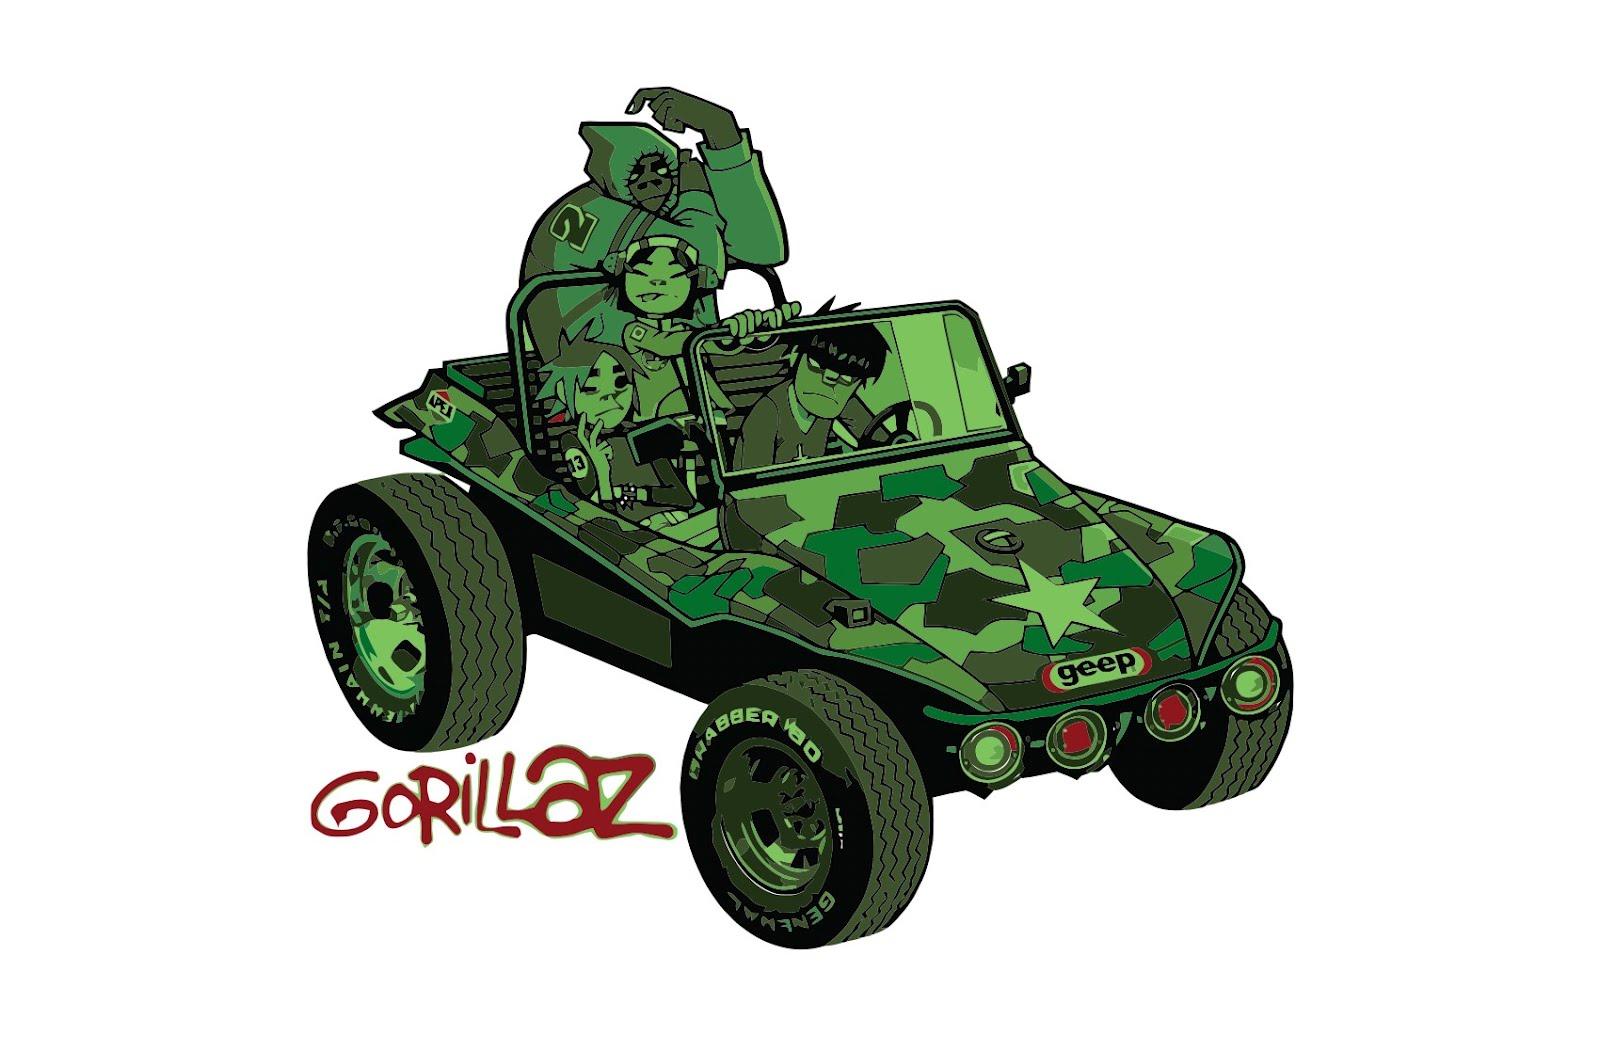 Gorillaz Buggy Geep Vector T Shirts